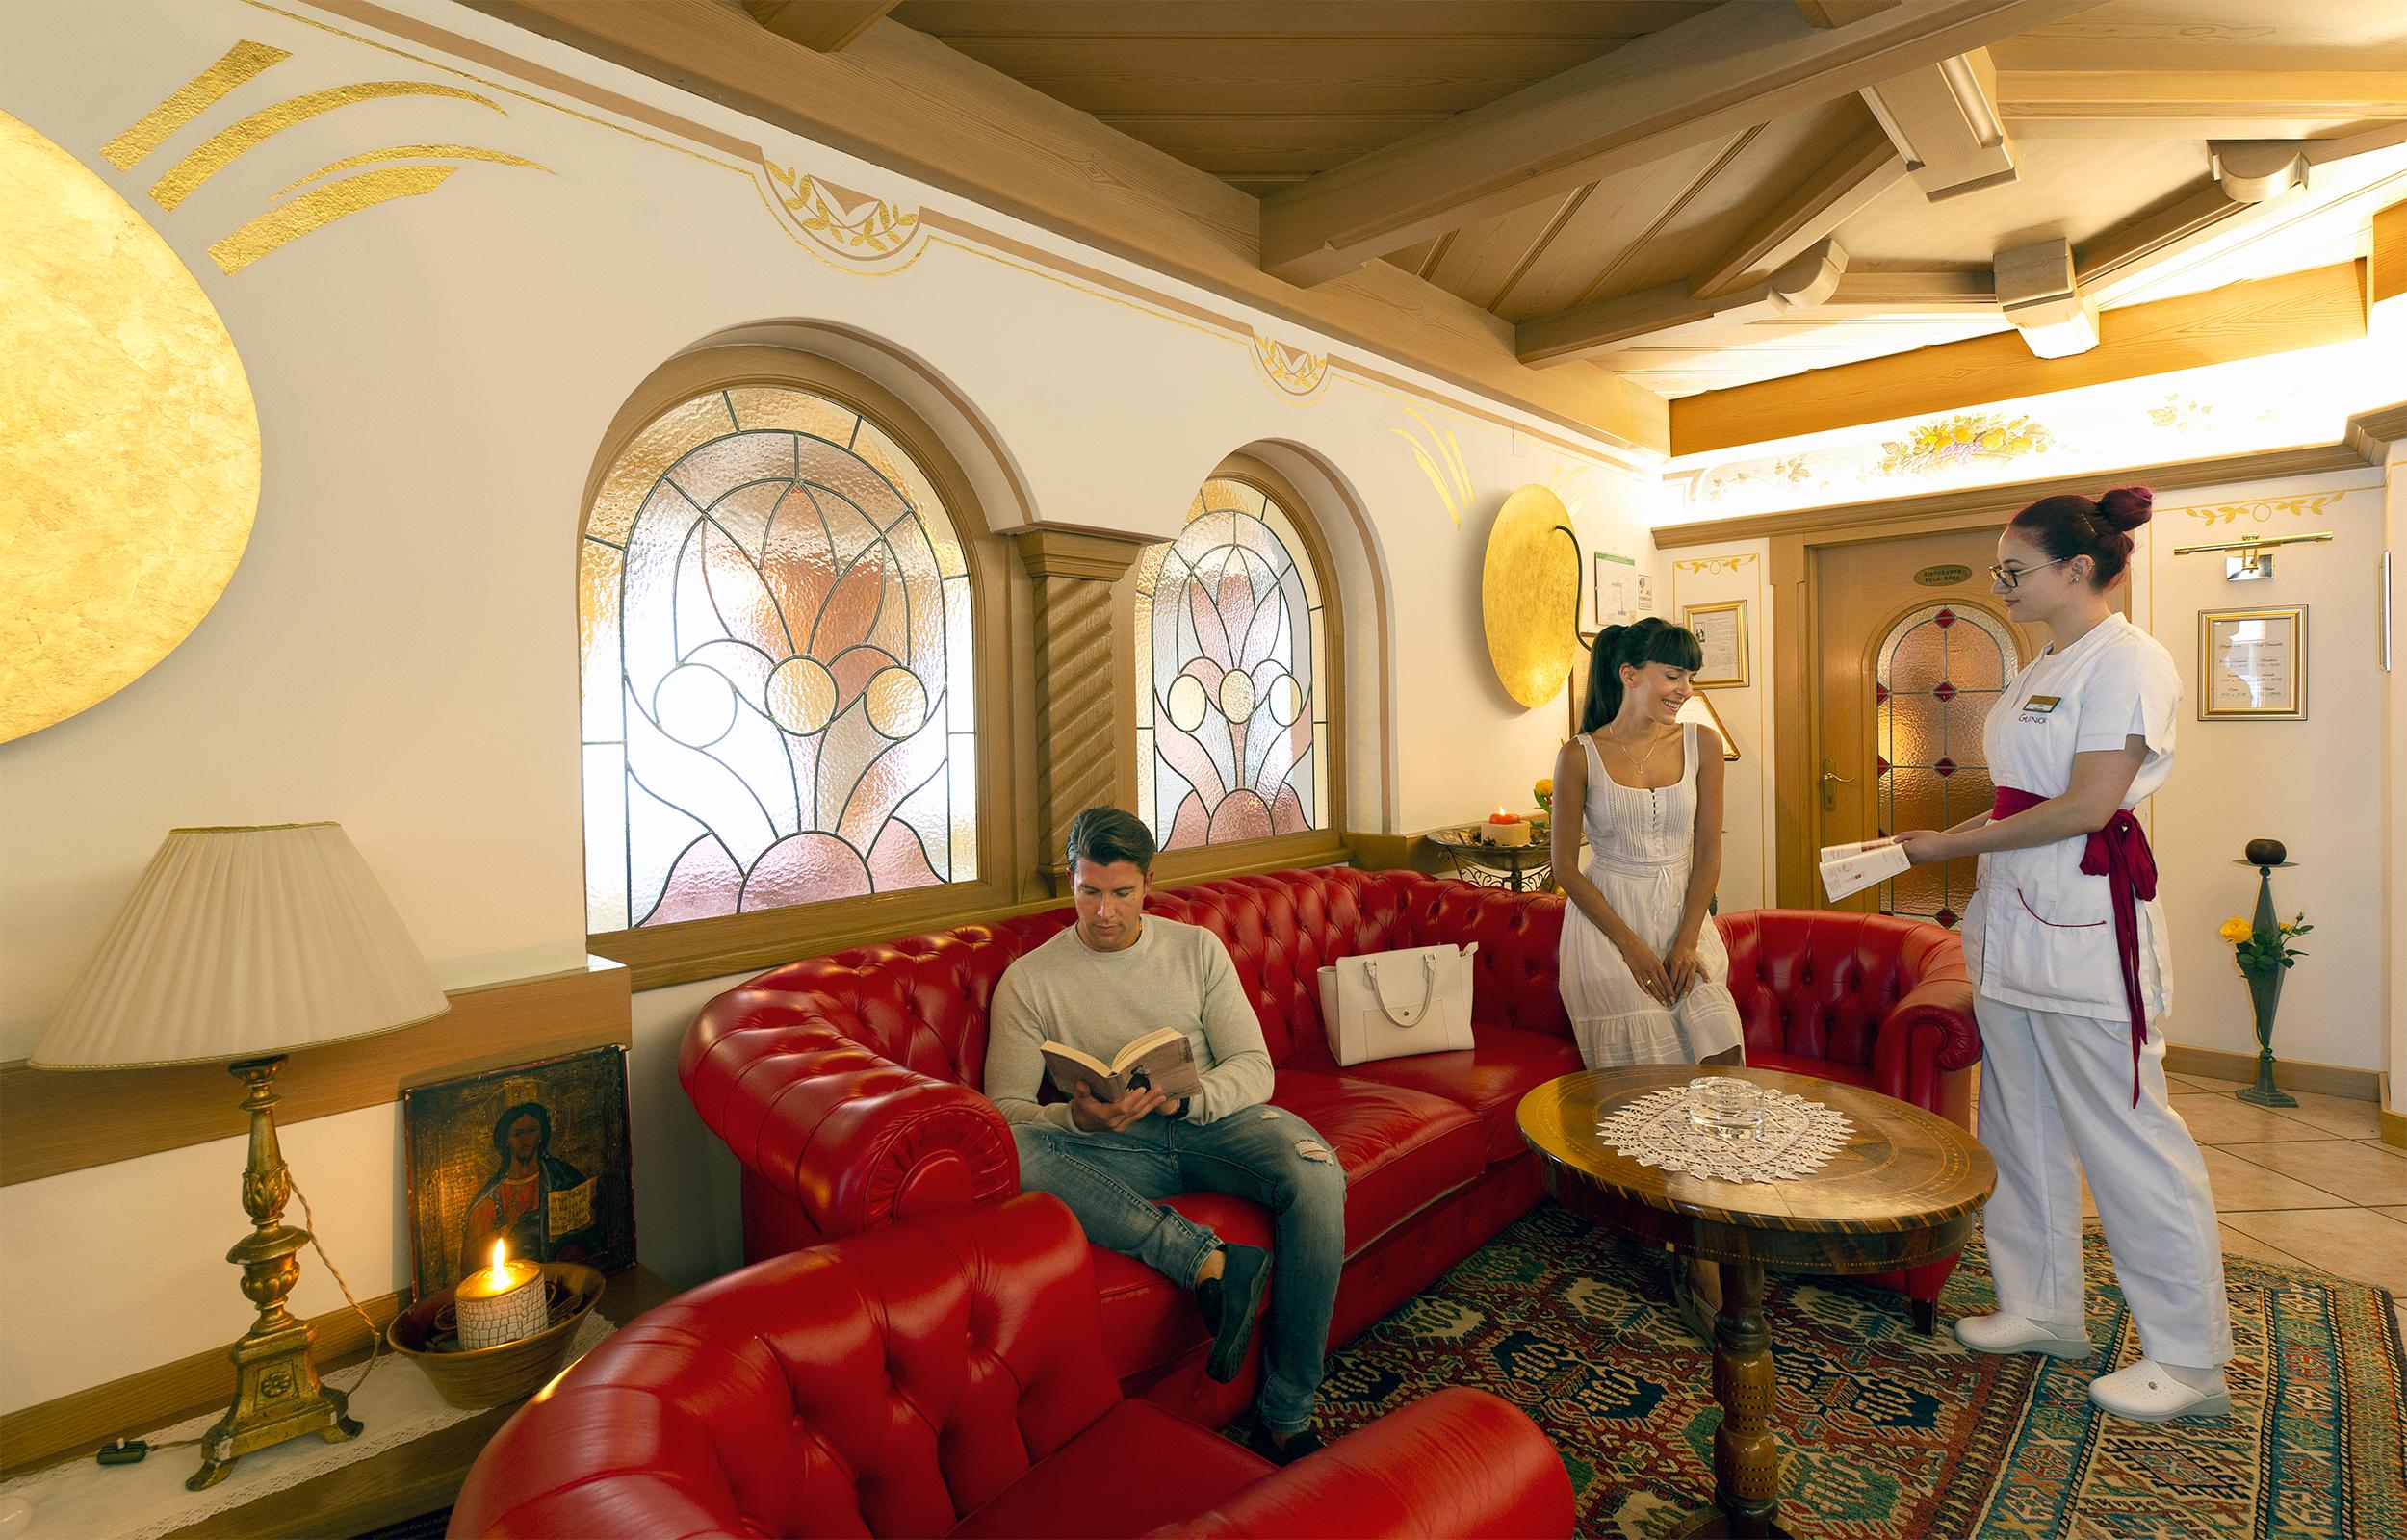 lhotel moena stelle casa ambienti vacanza ideale fassa